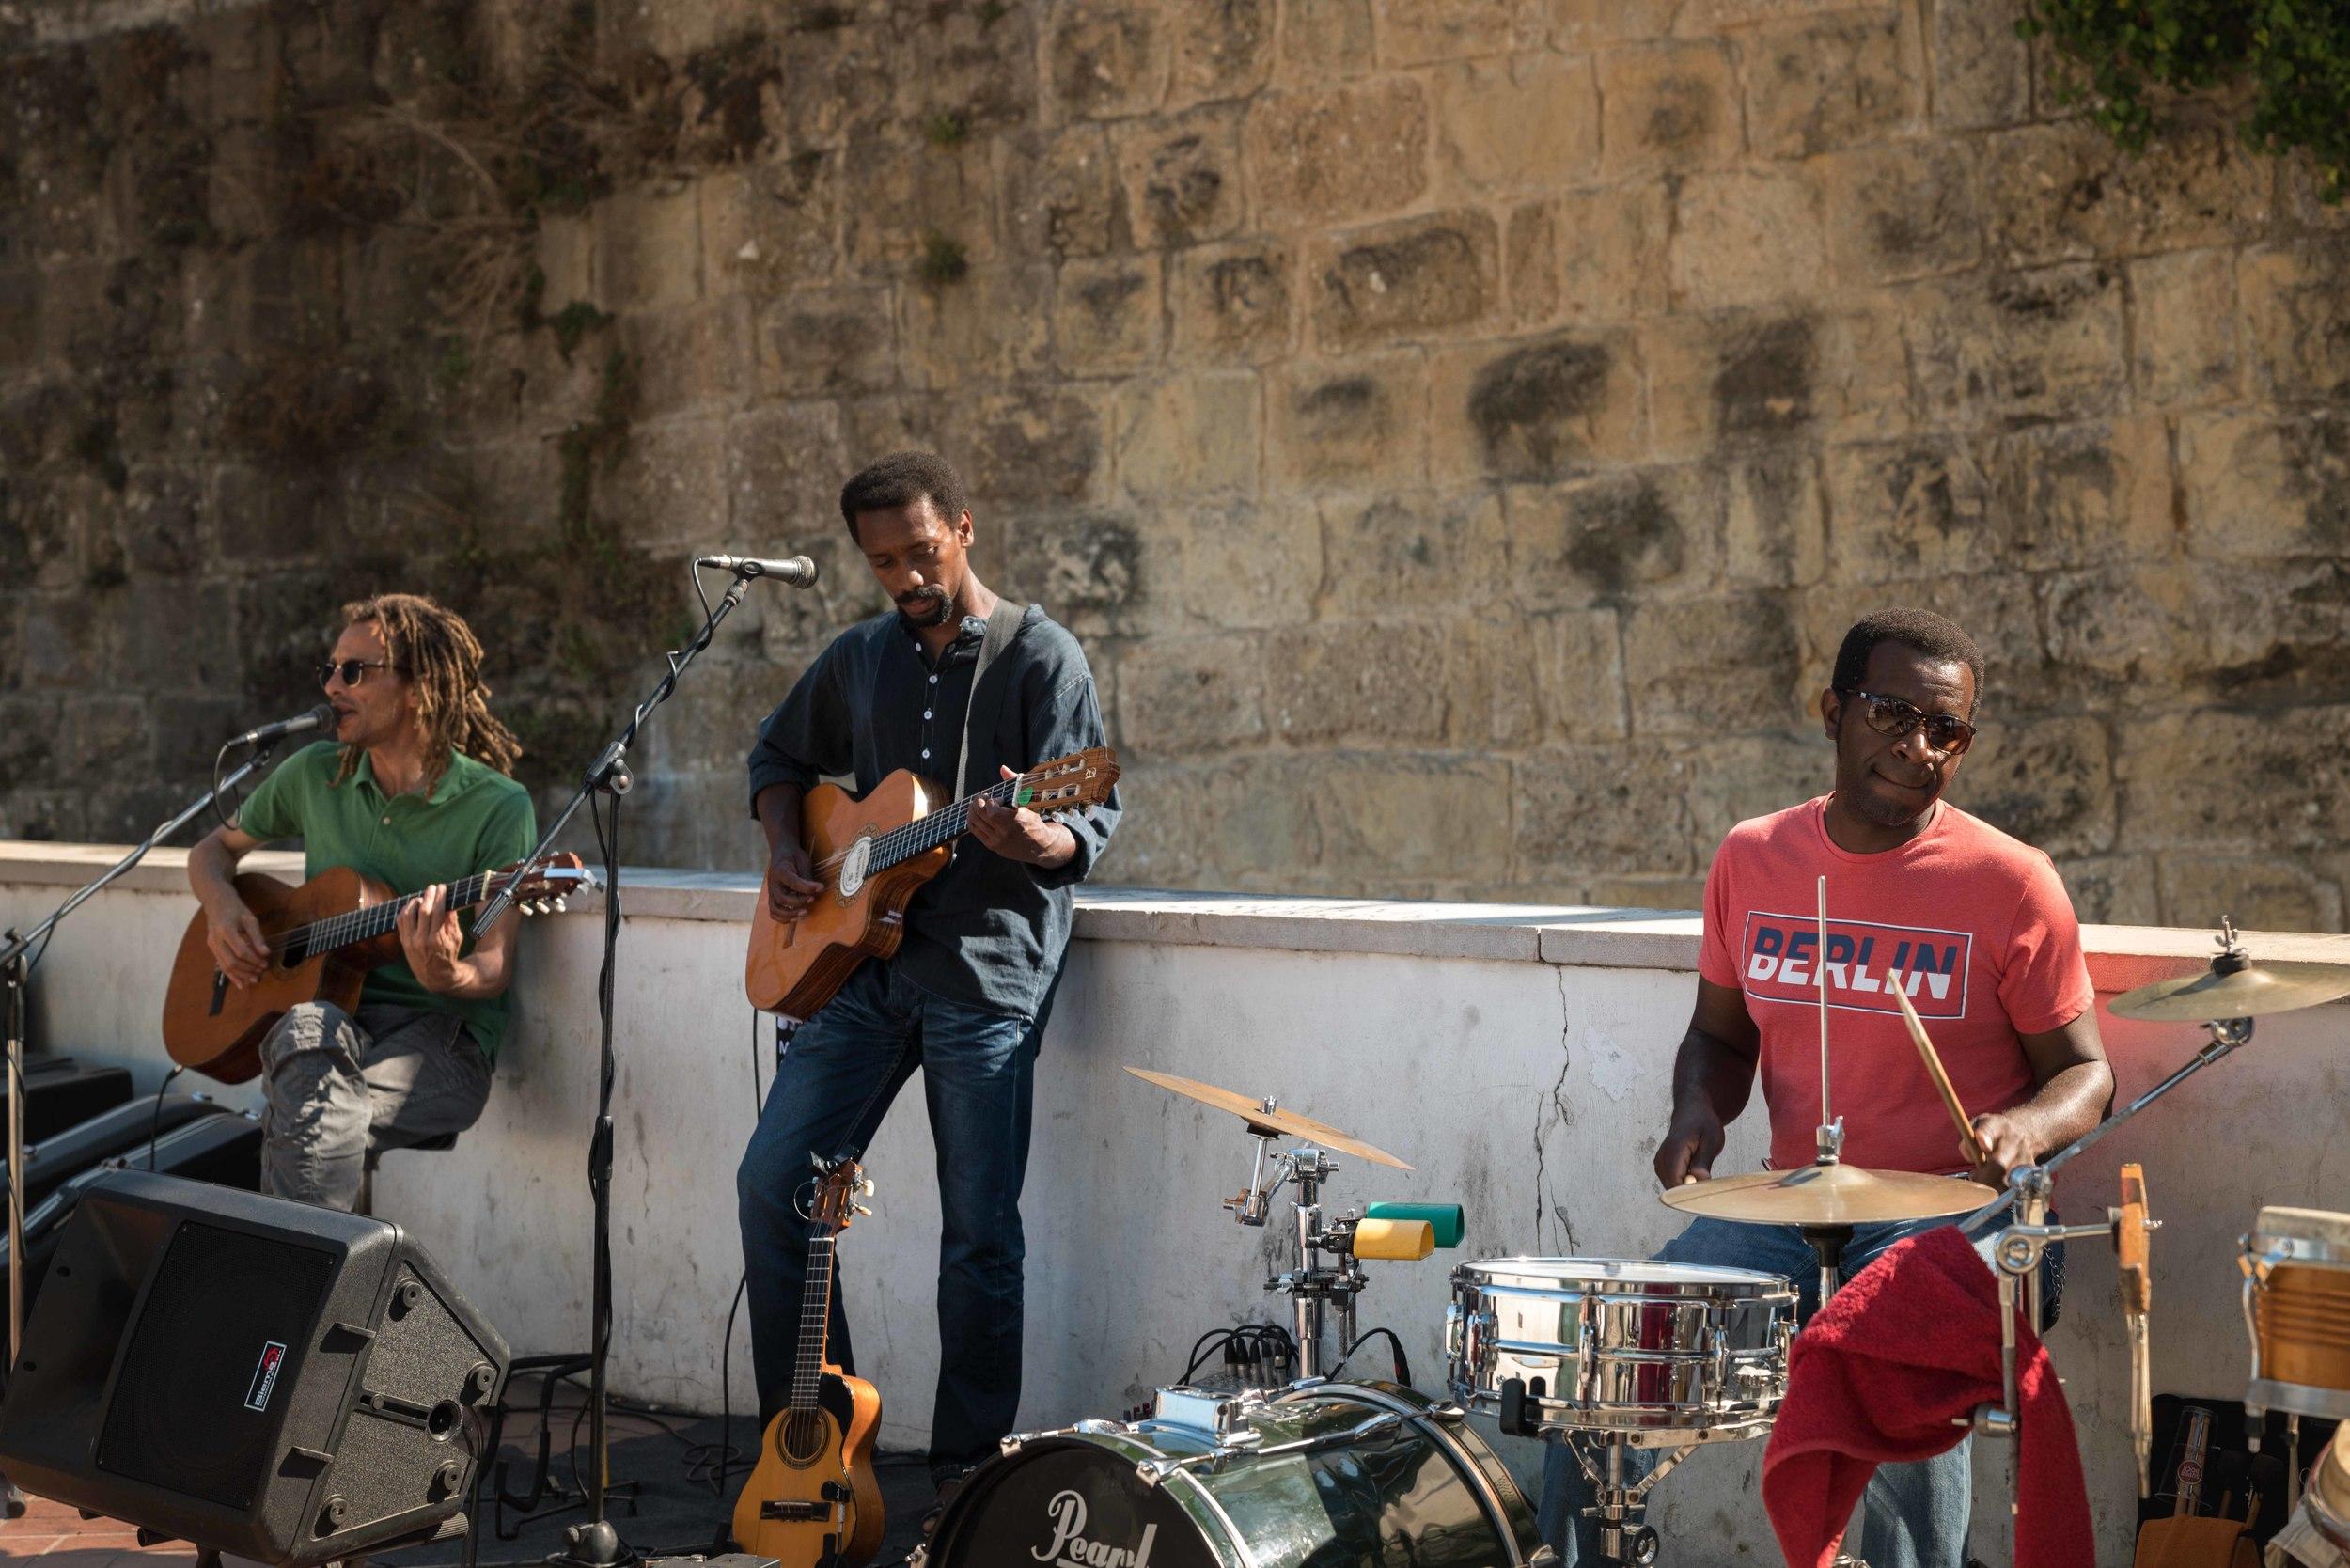 DSC02580_sRGB_CO_Relative_Reggae in Lisbon.jpg